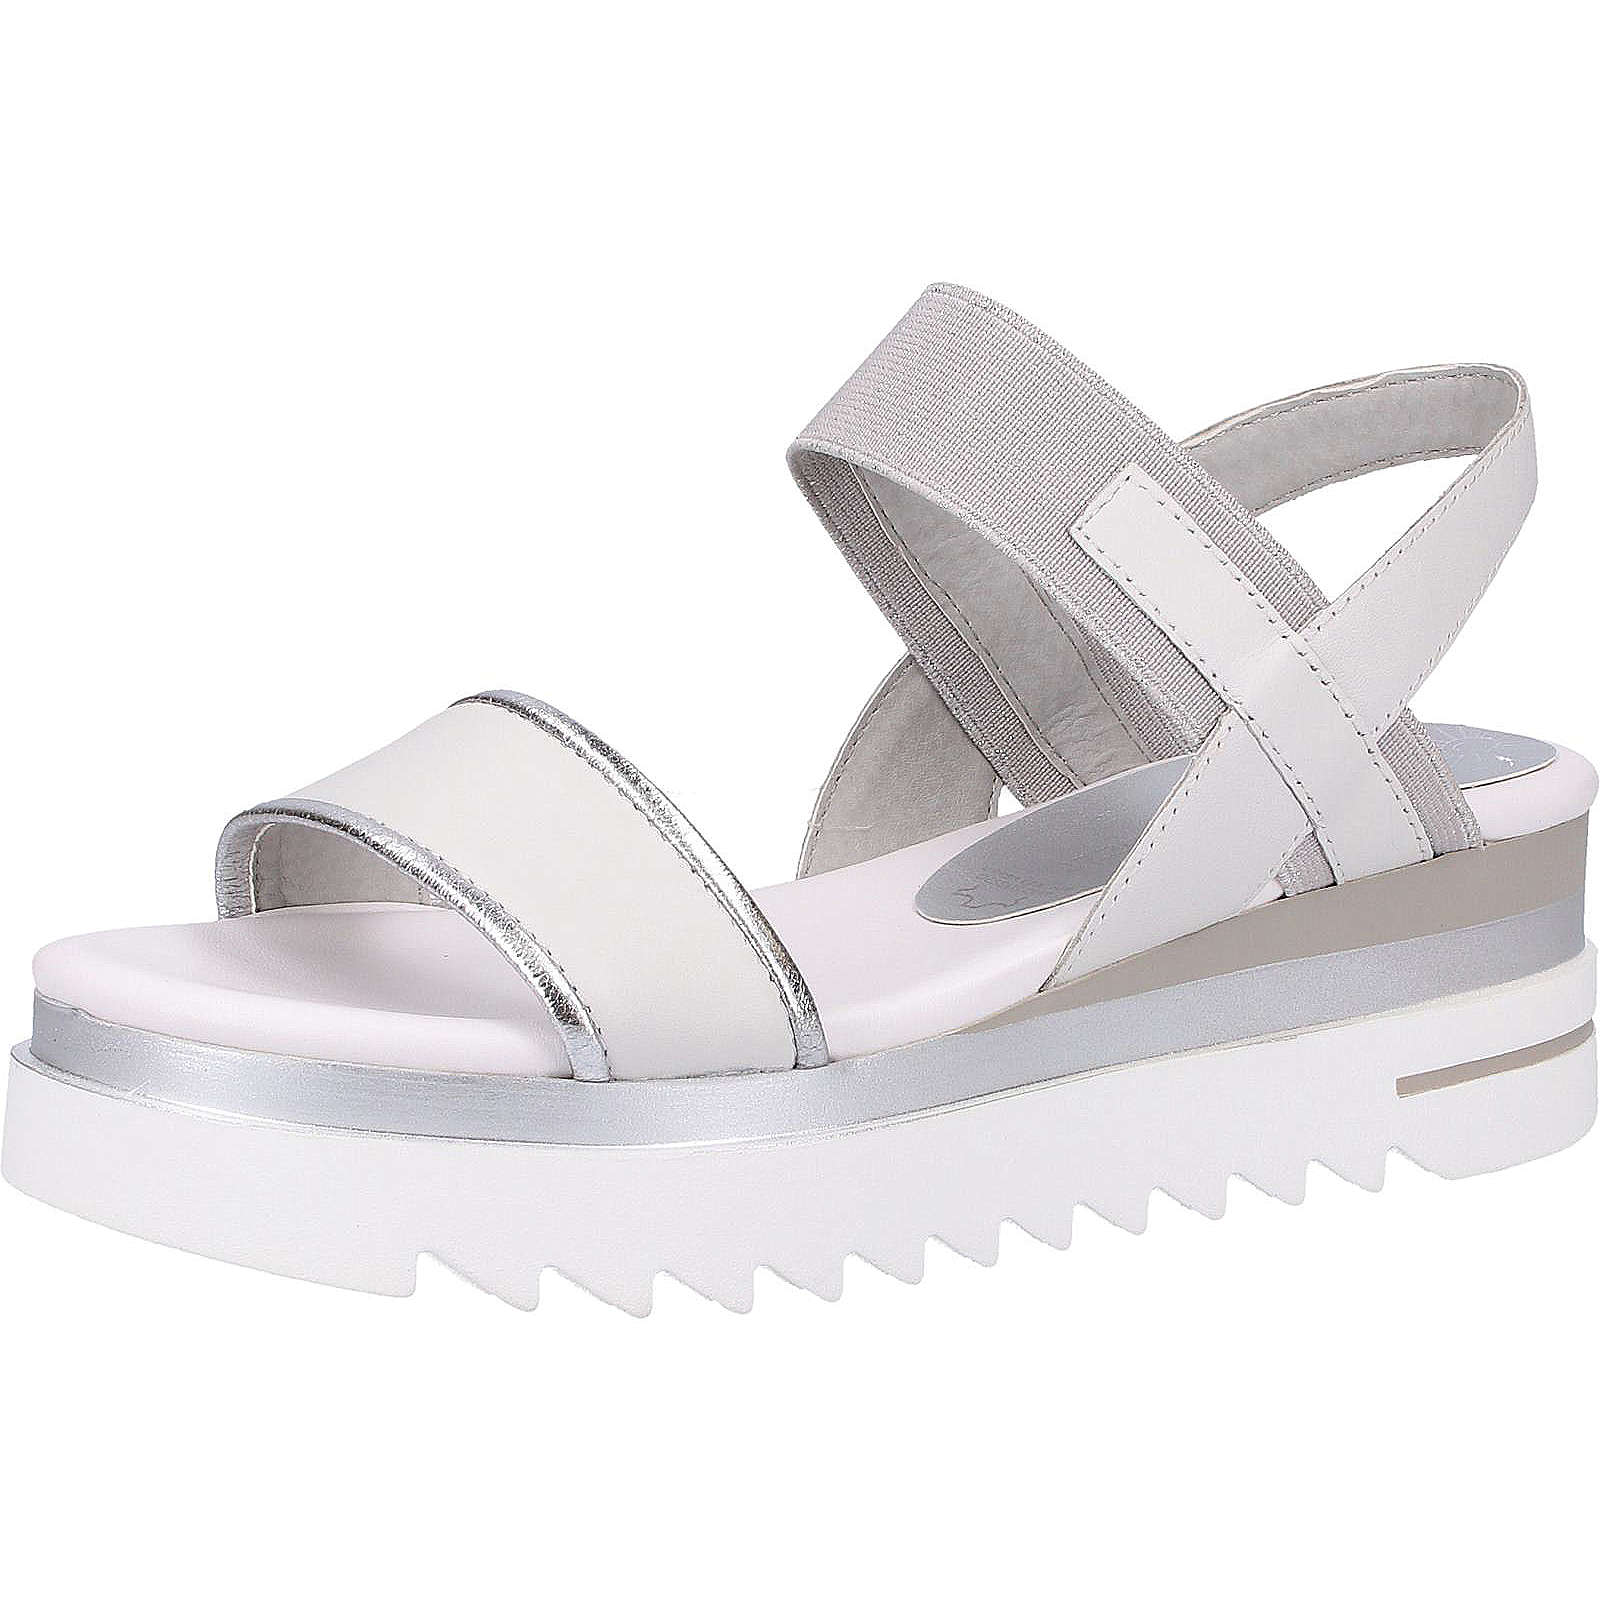 MARCO TOZZI Sandalen Klassische Sandaletten weiß Damen Gr. 40